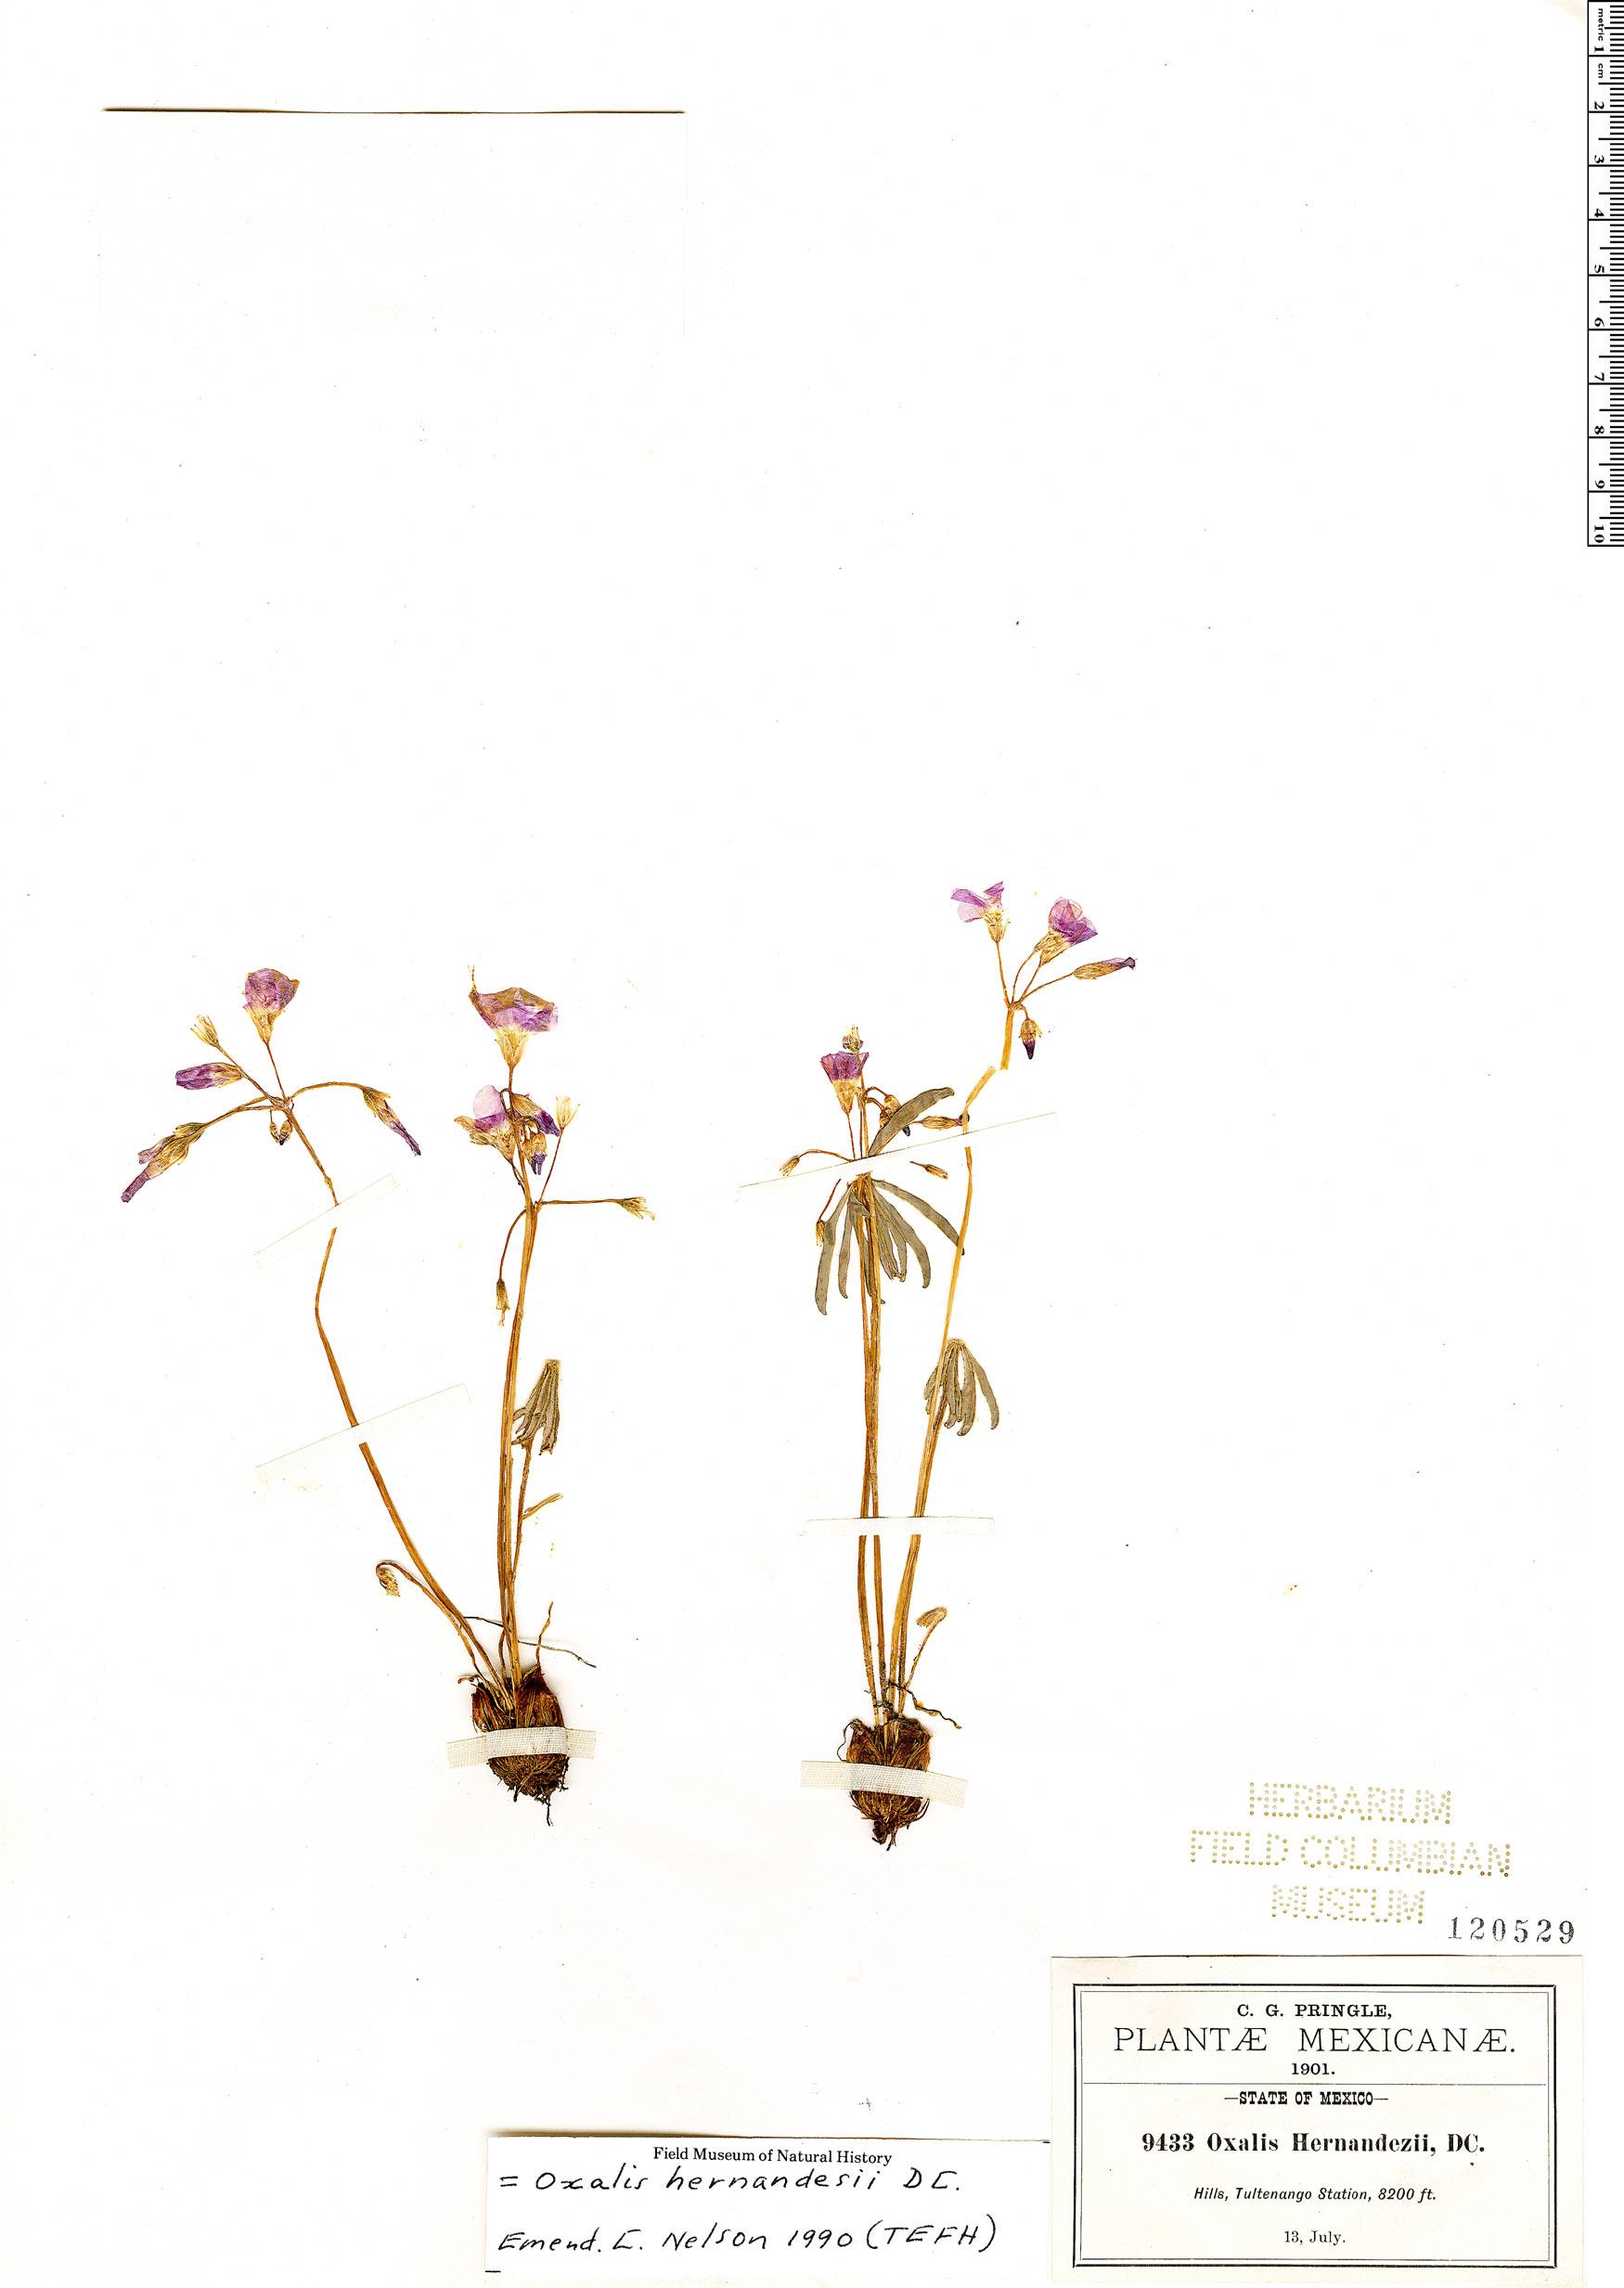 Specimen: Oxalis hernandesii